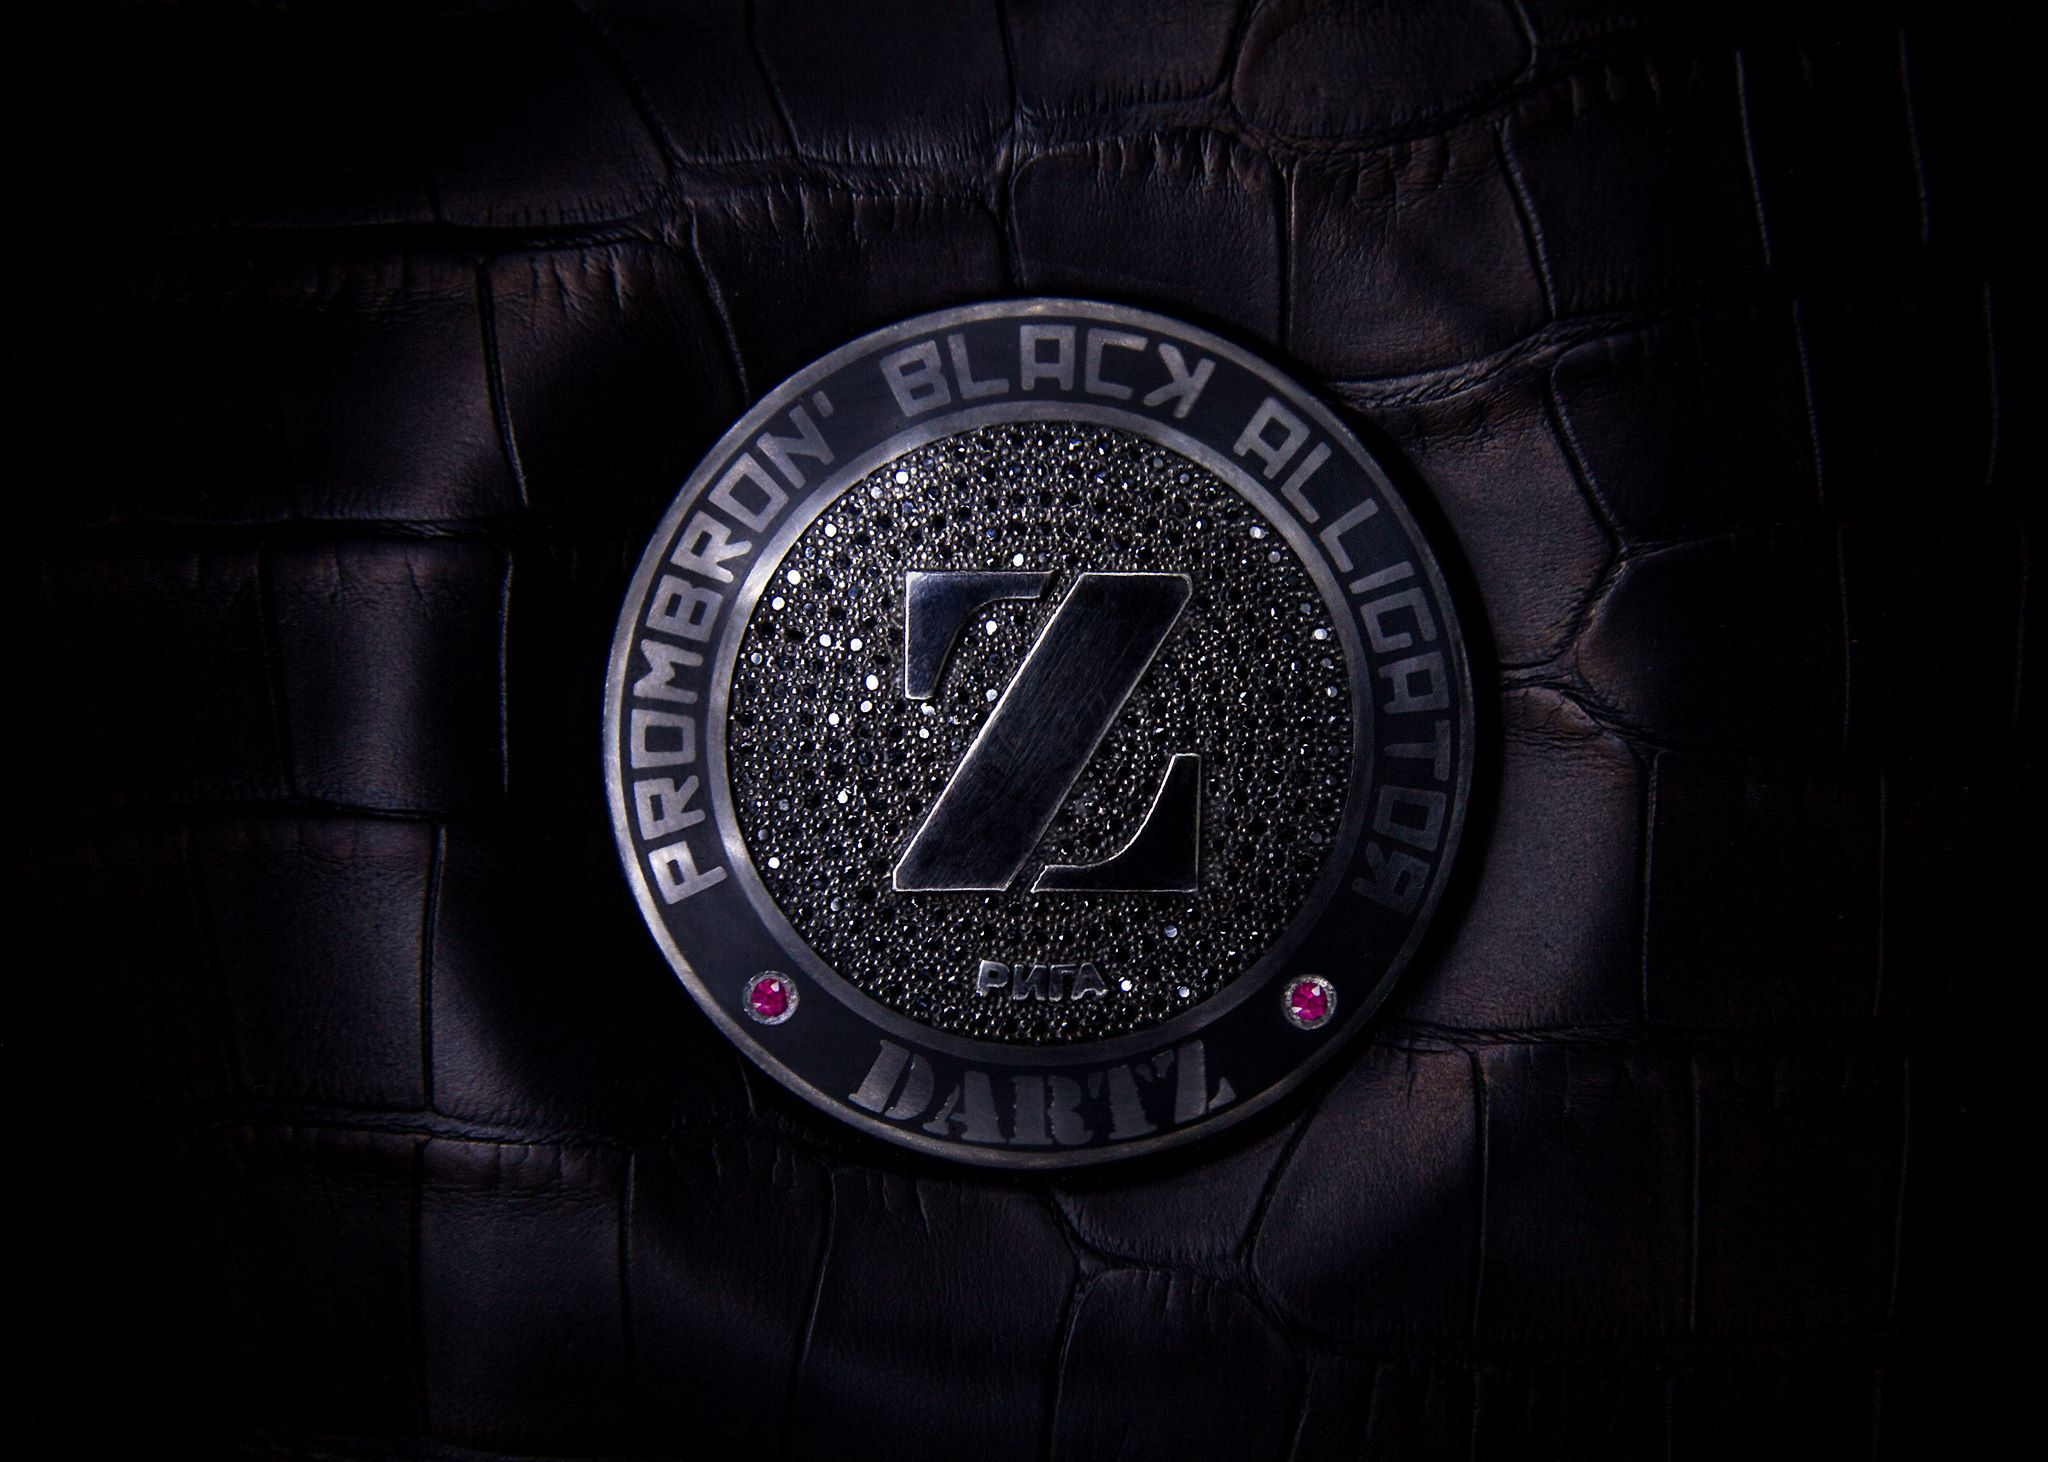 Dartz Prombron Black Shark steering wheel | Dartz